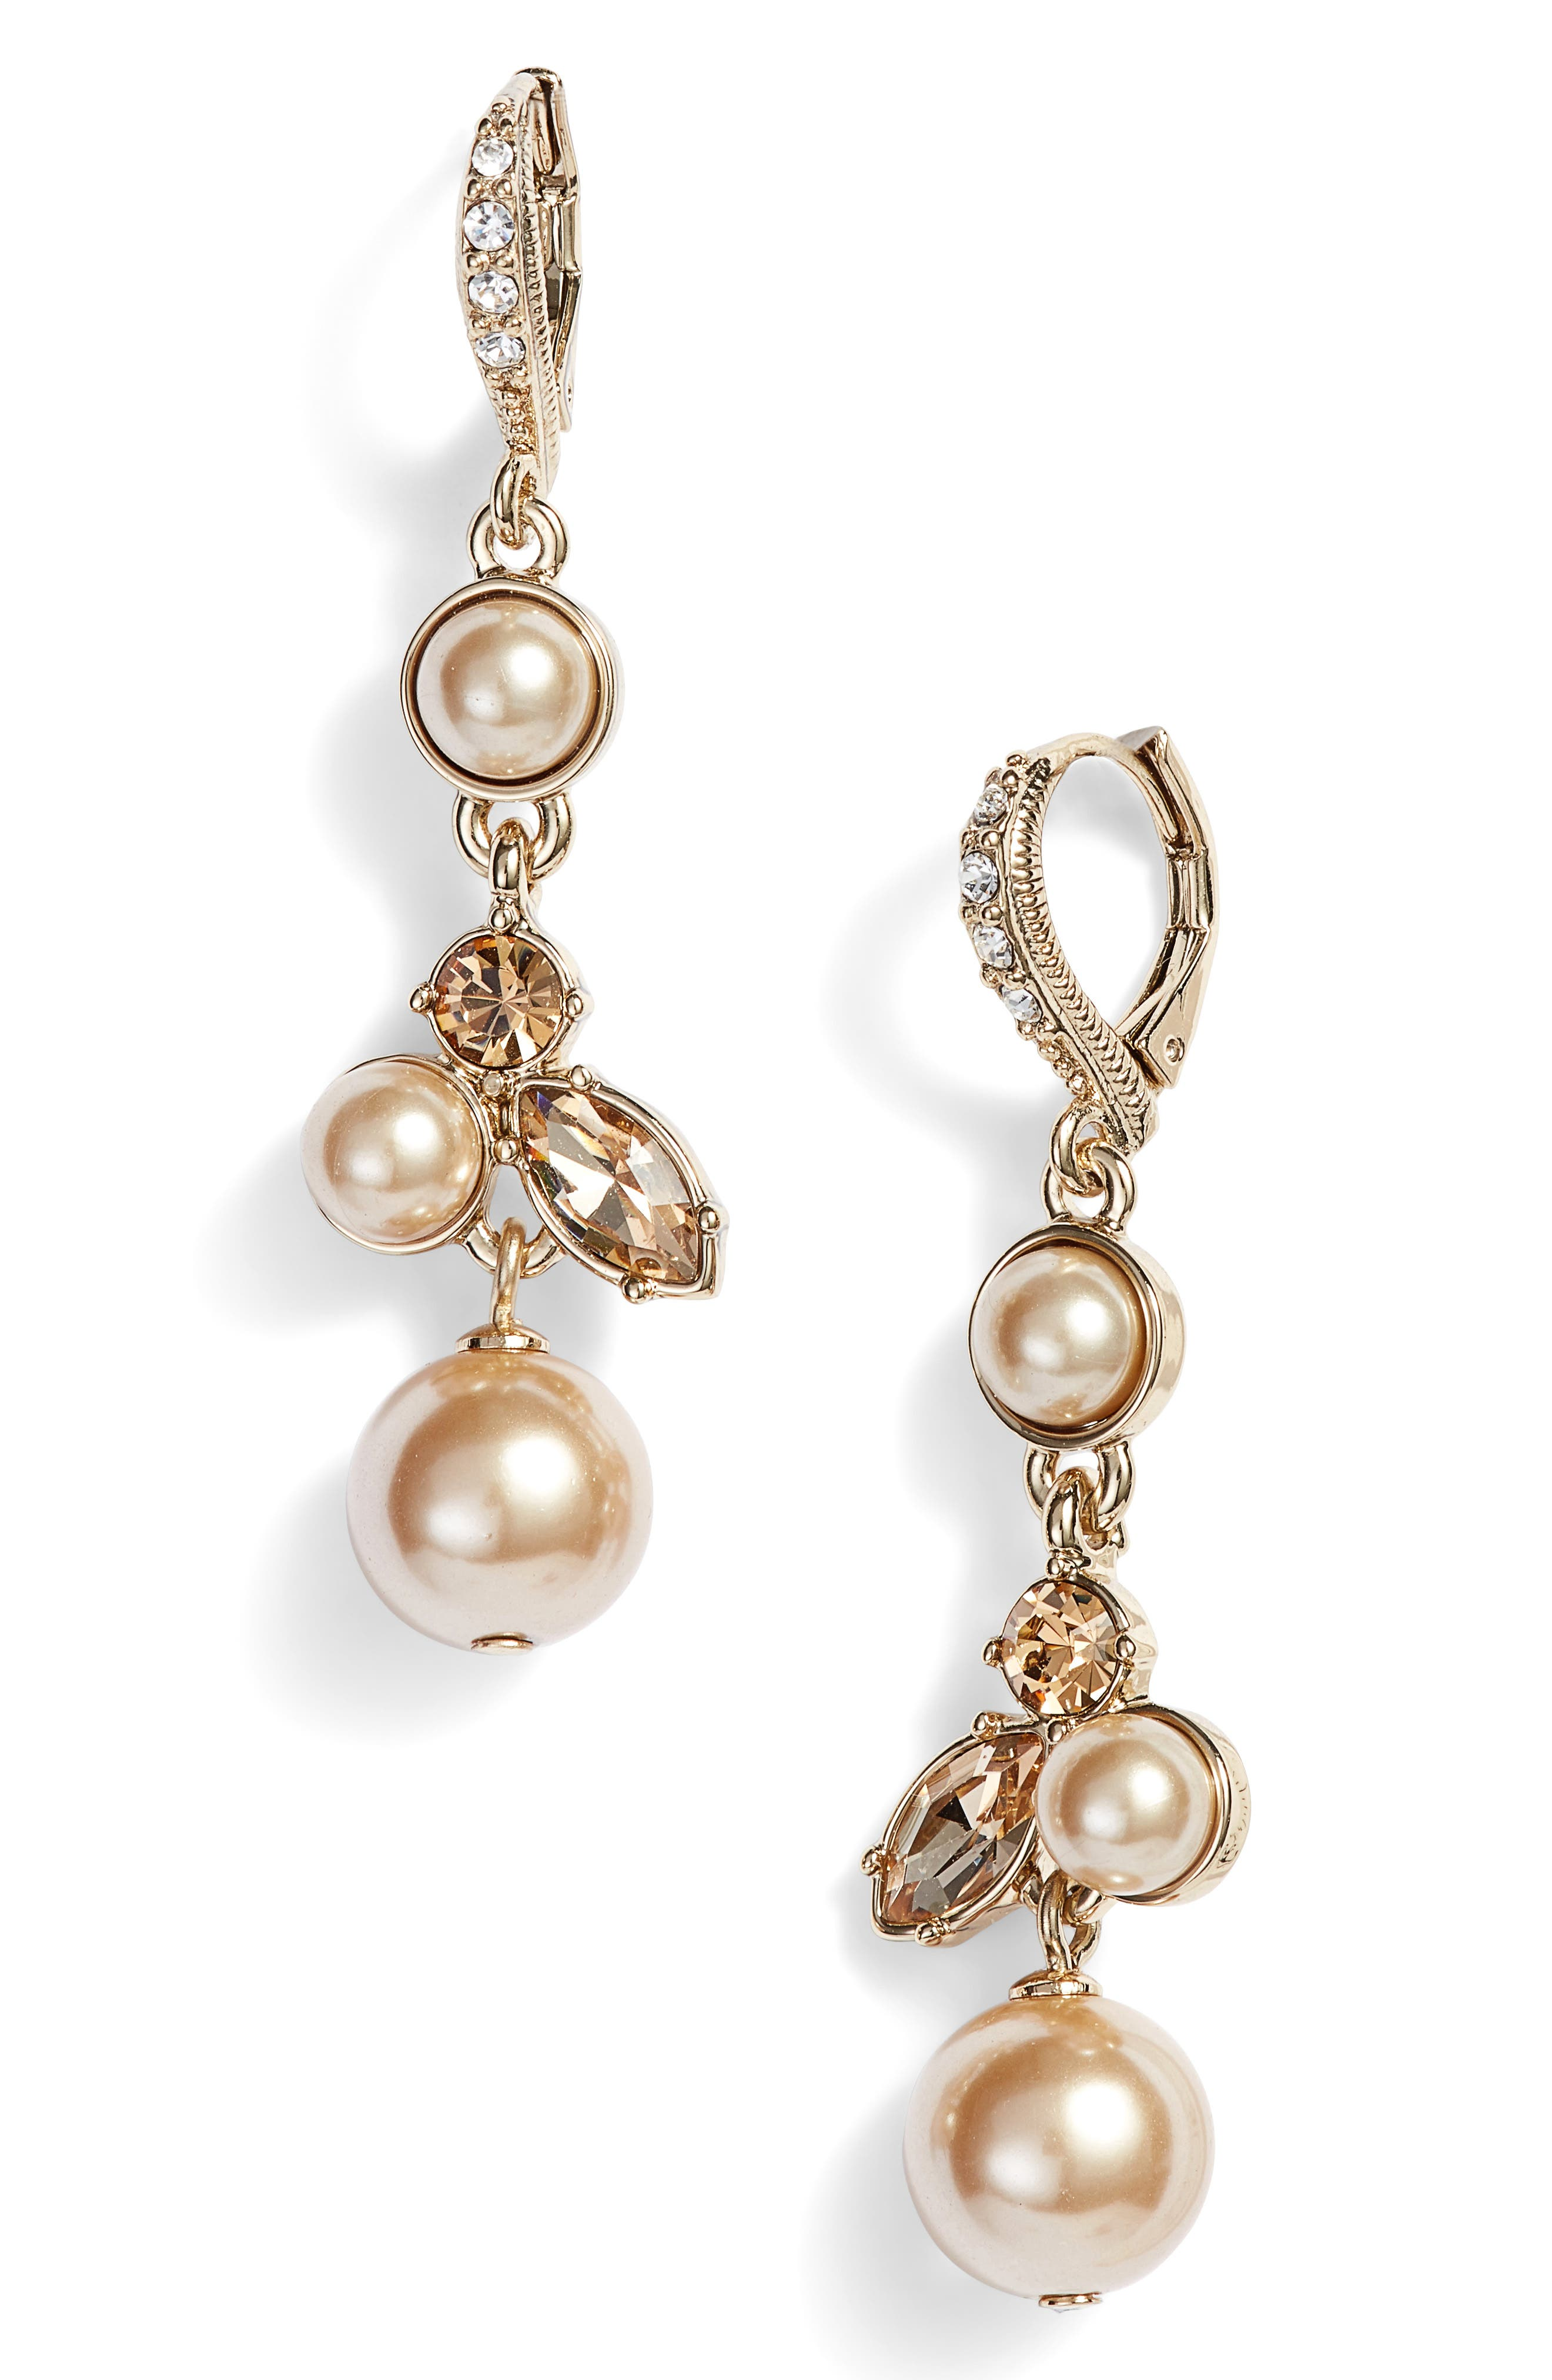 Givenchy Imitation Pearl Drop Earrings